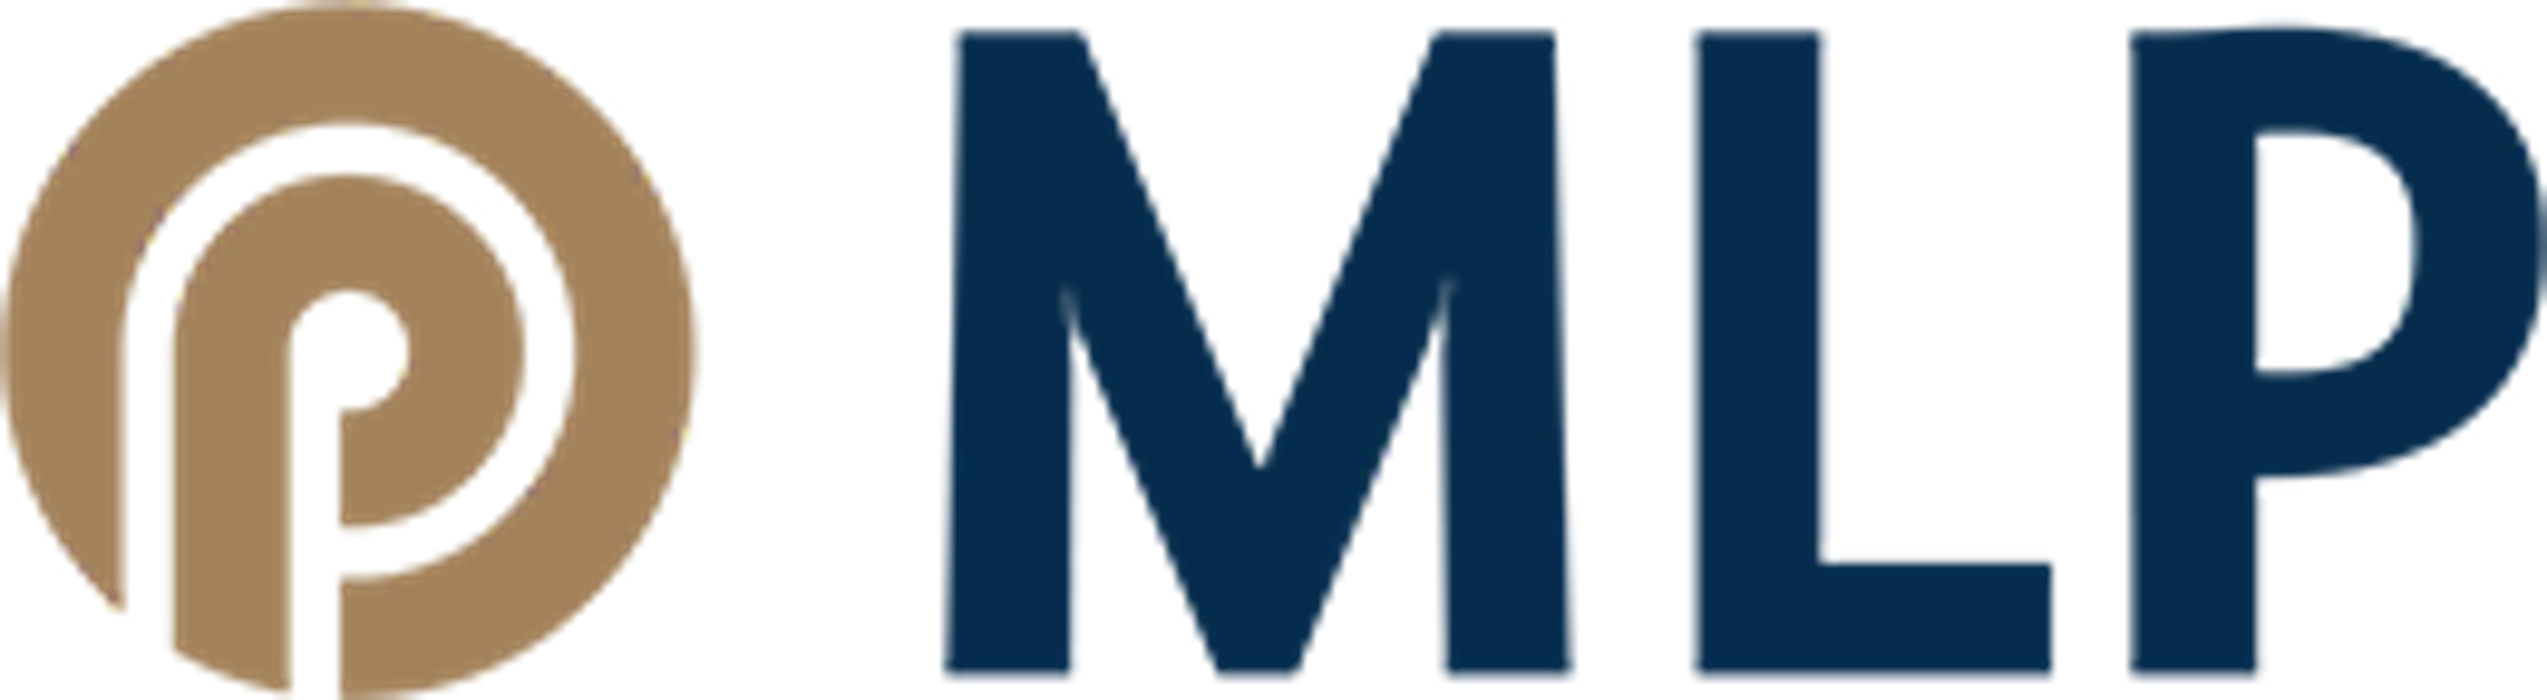 Logo von MLP Geschäftsstelle Berlin XIX